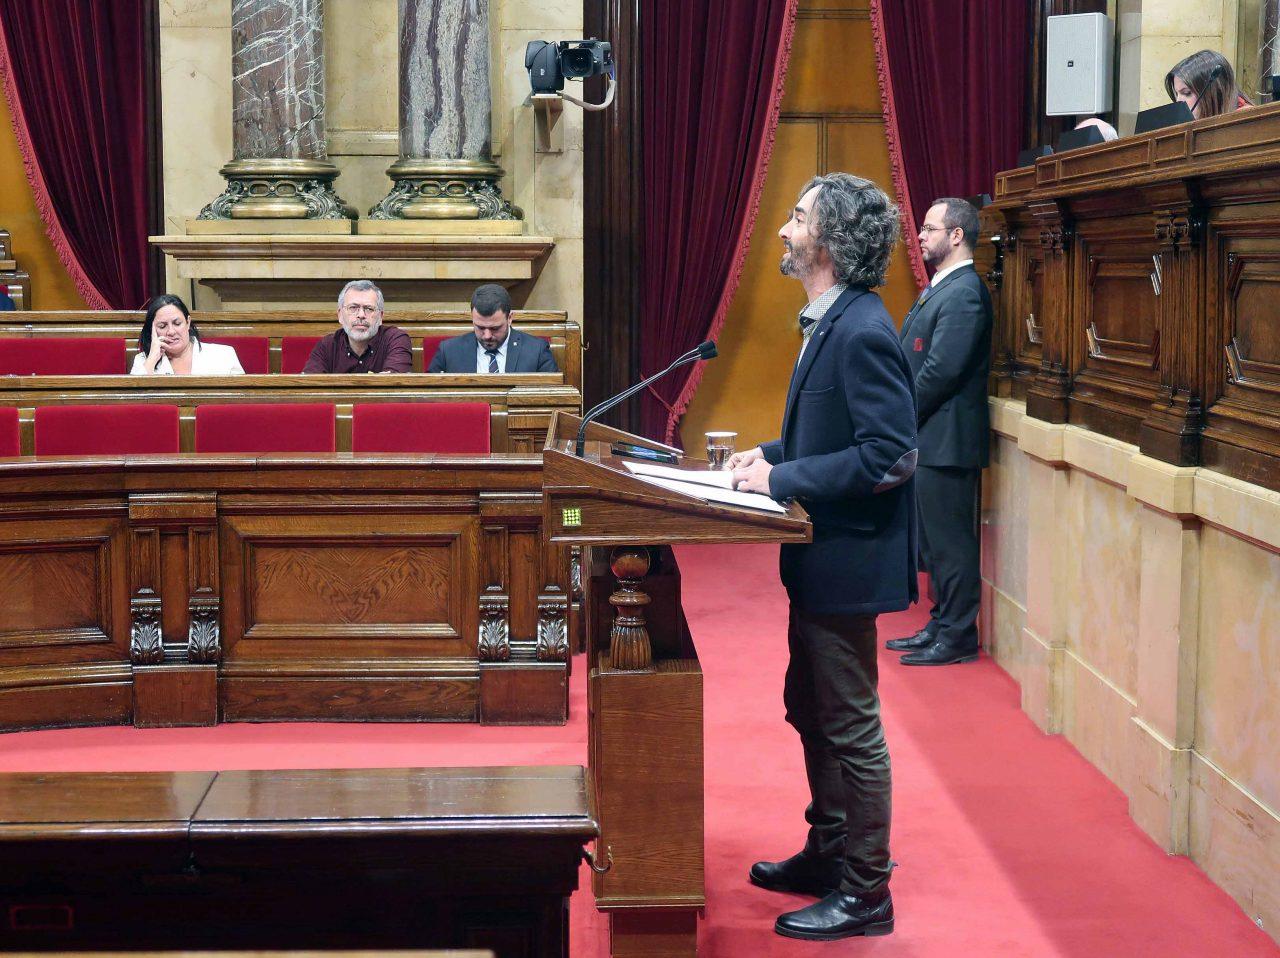 carles-castillo-parlament-2-1280x958.jpg